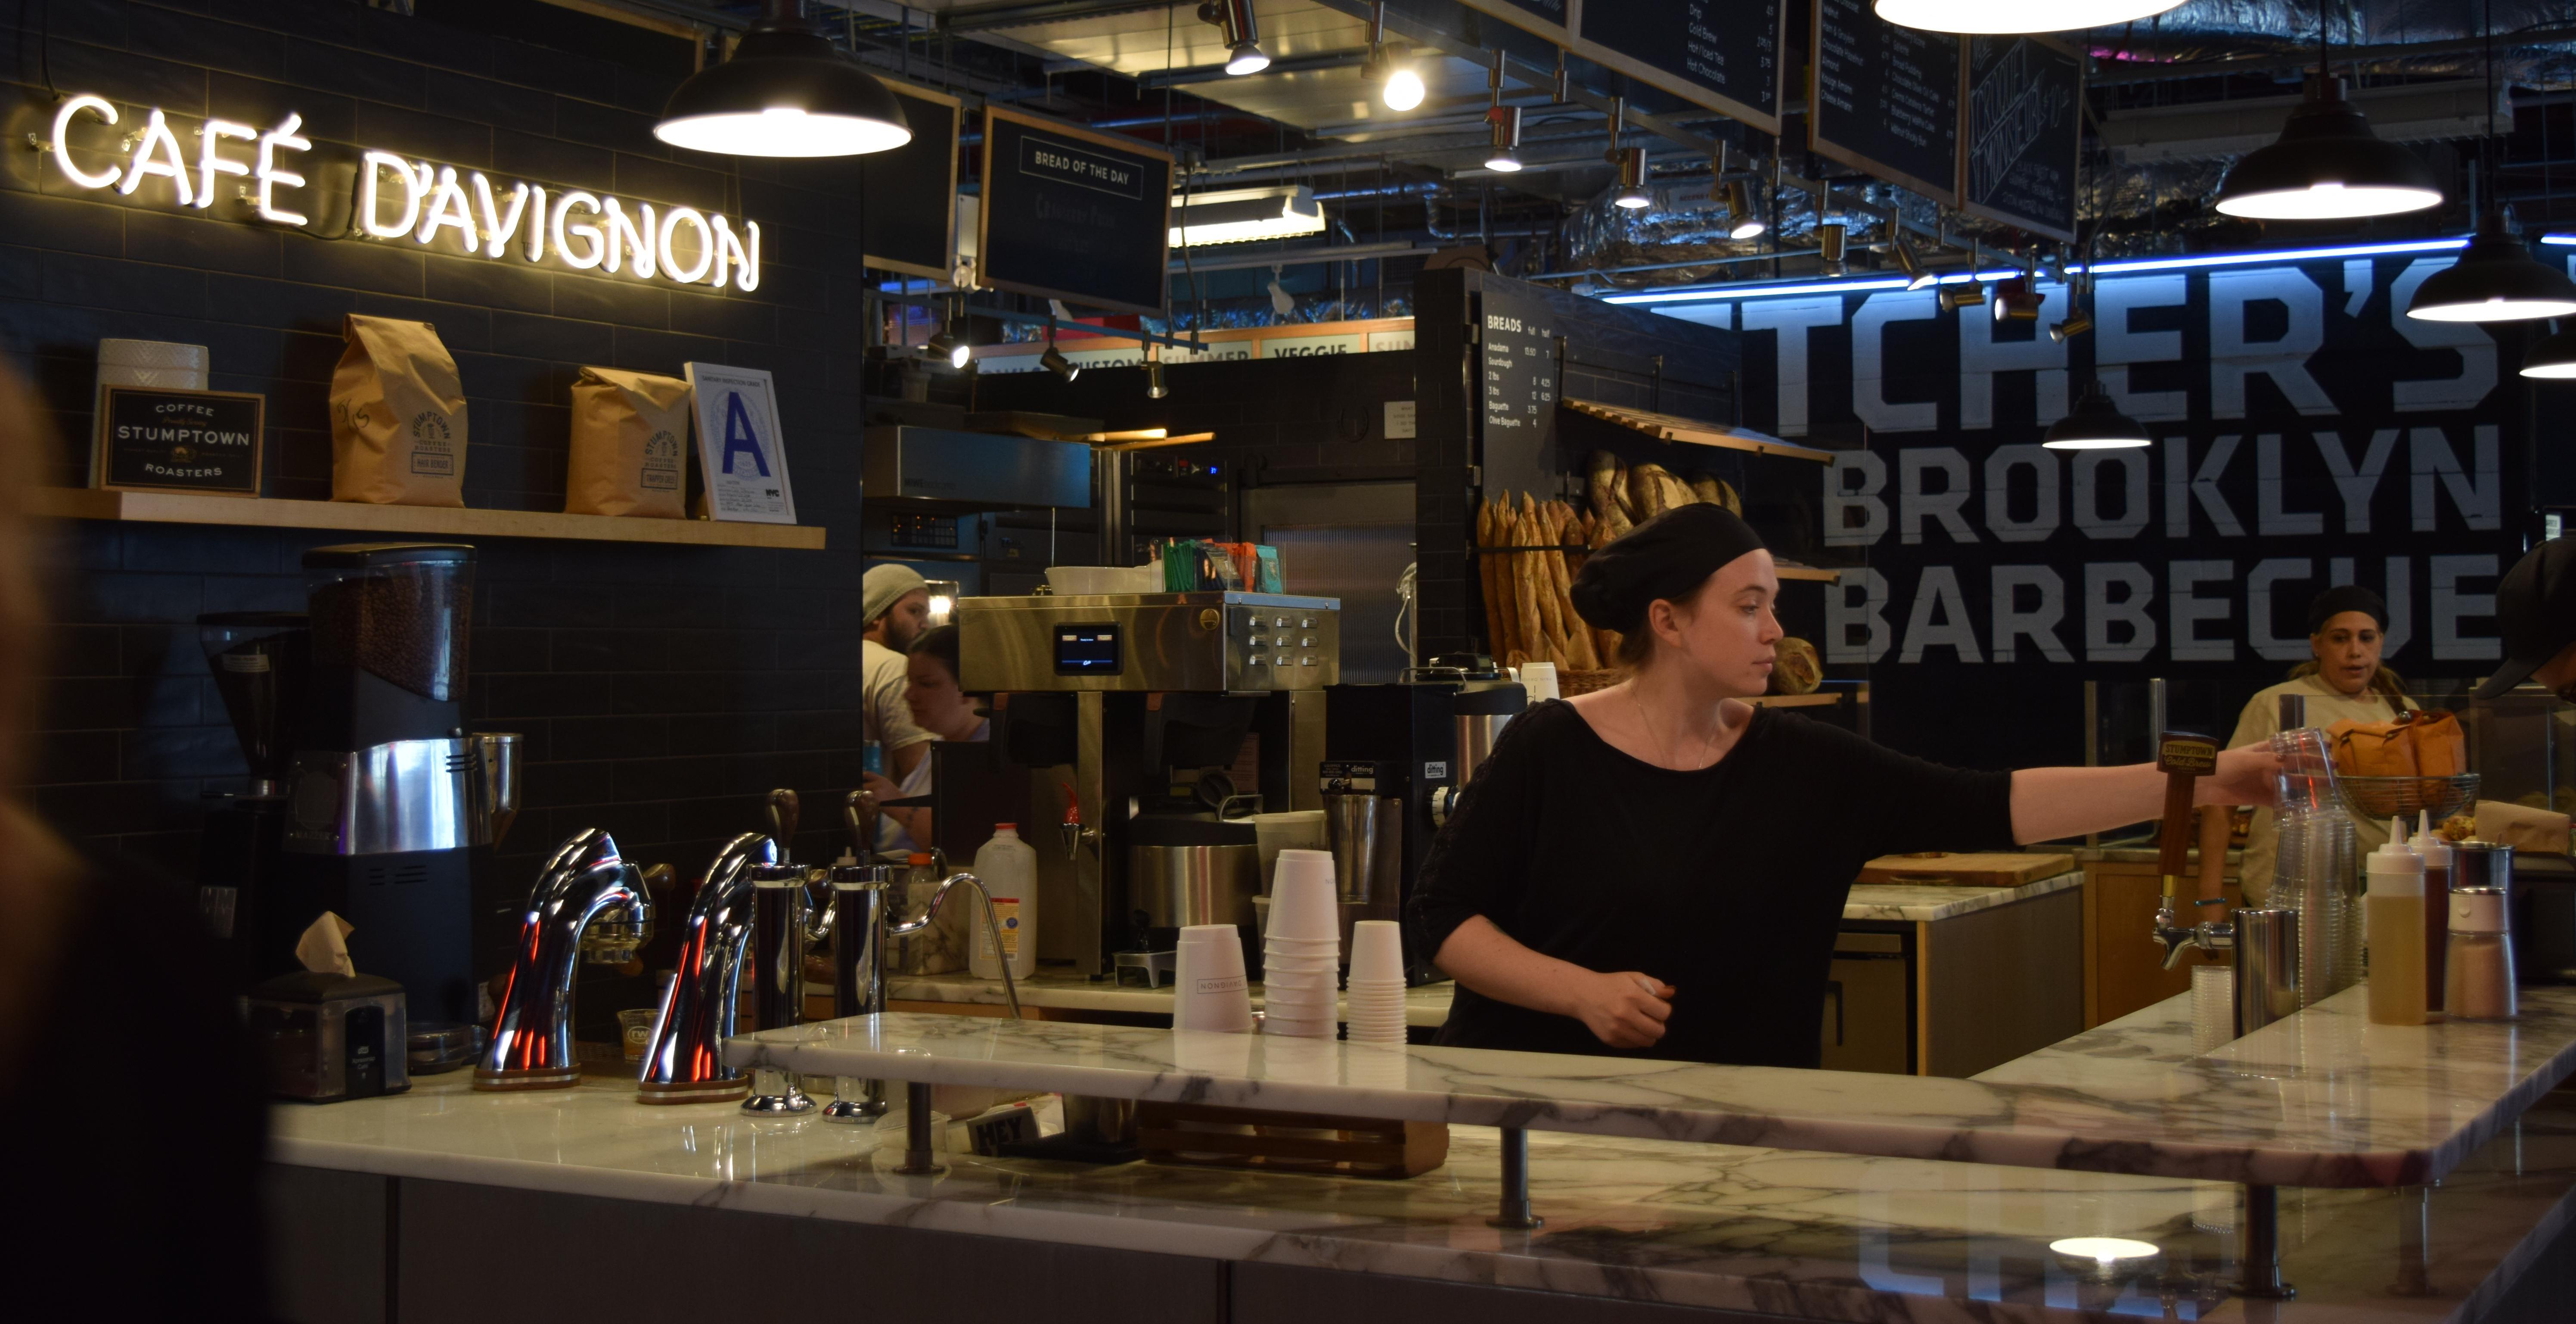 CAFE-DAVIGNON.JPG#asset:13918